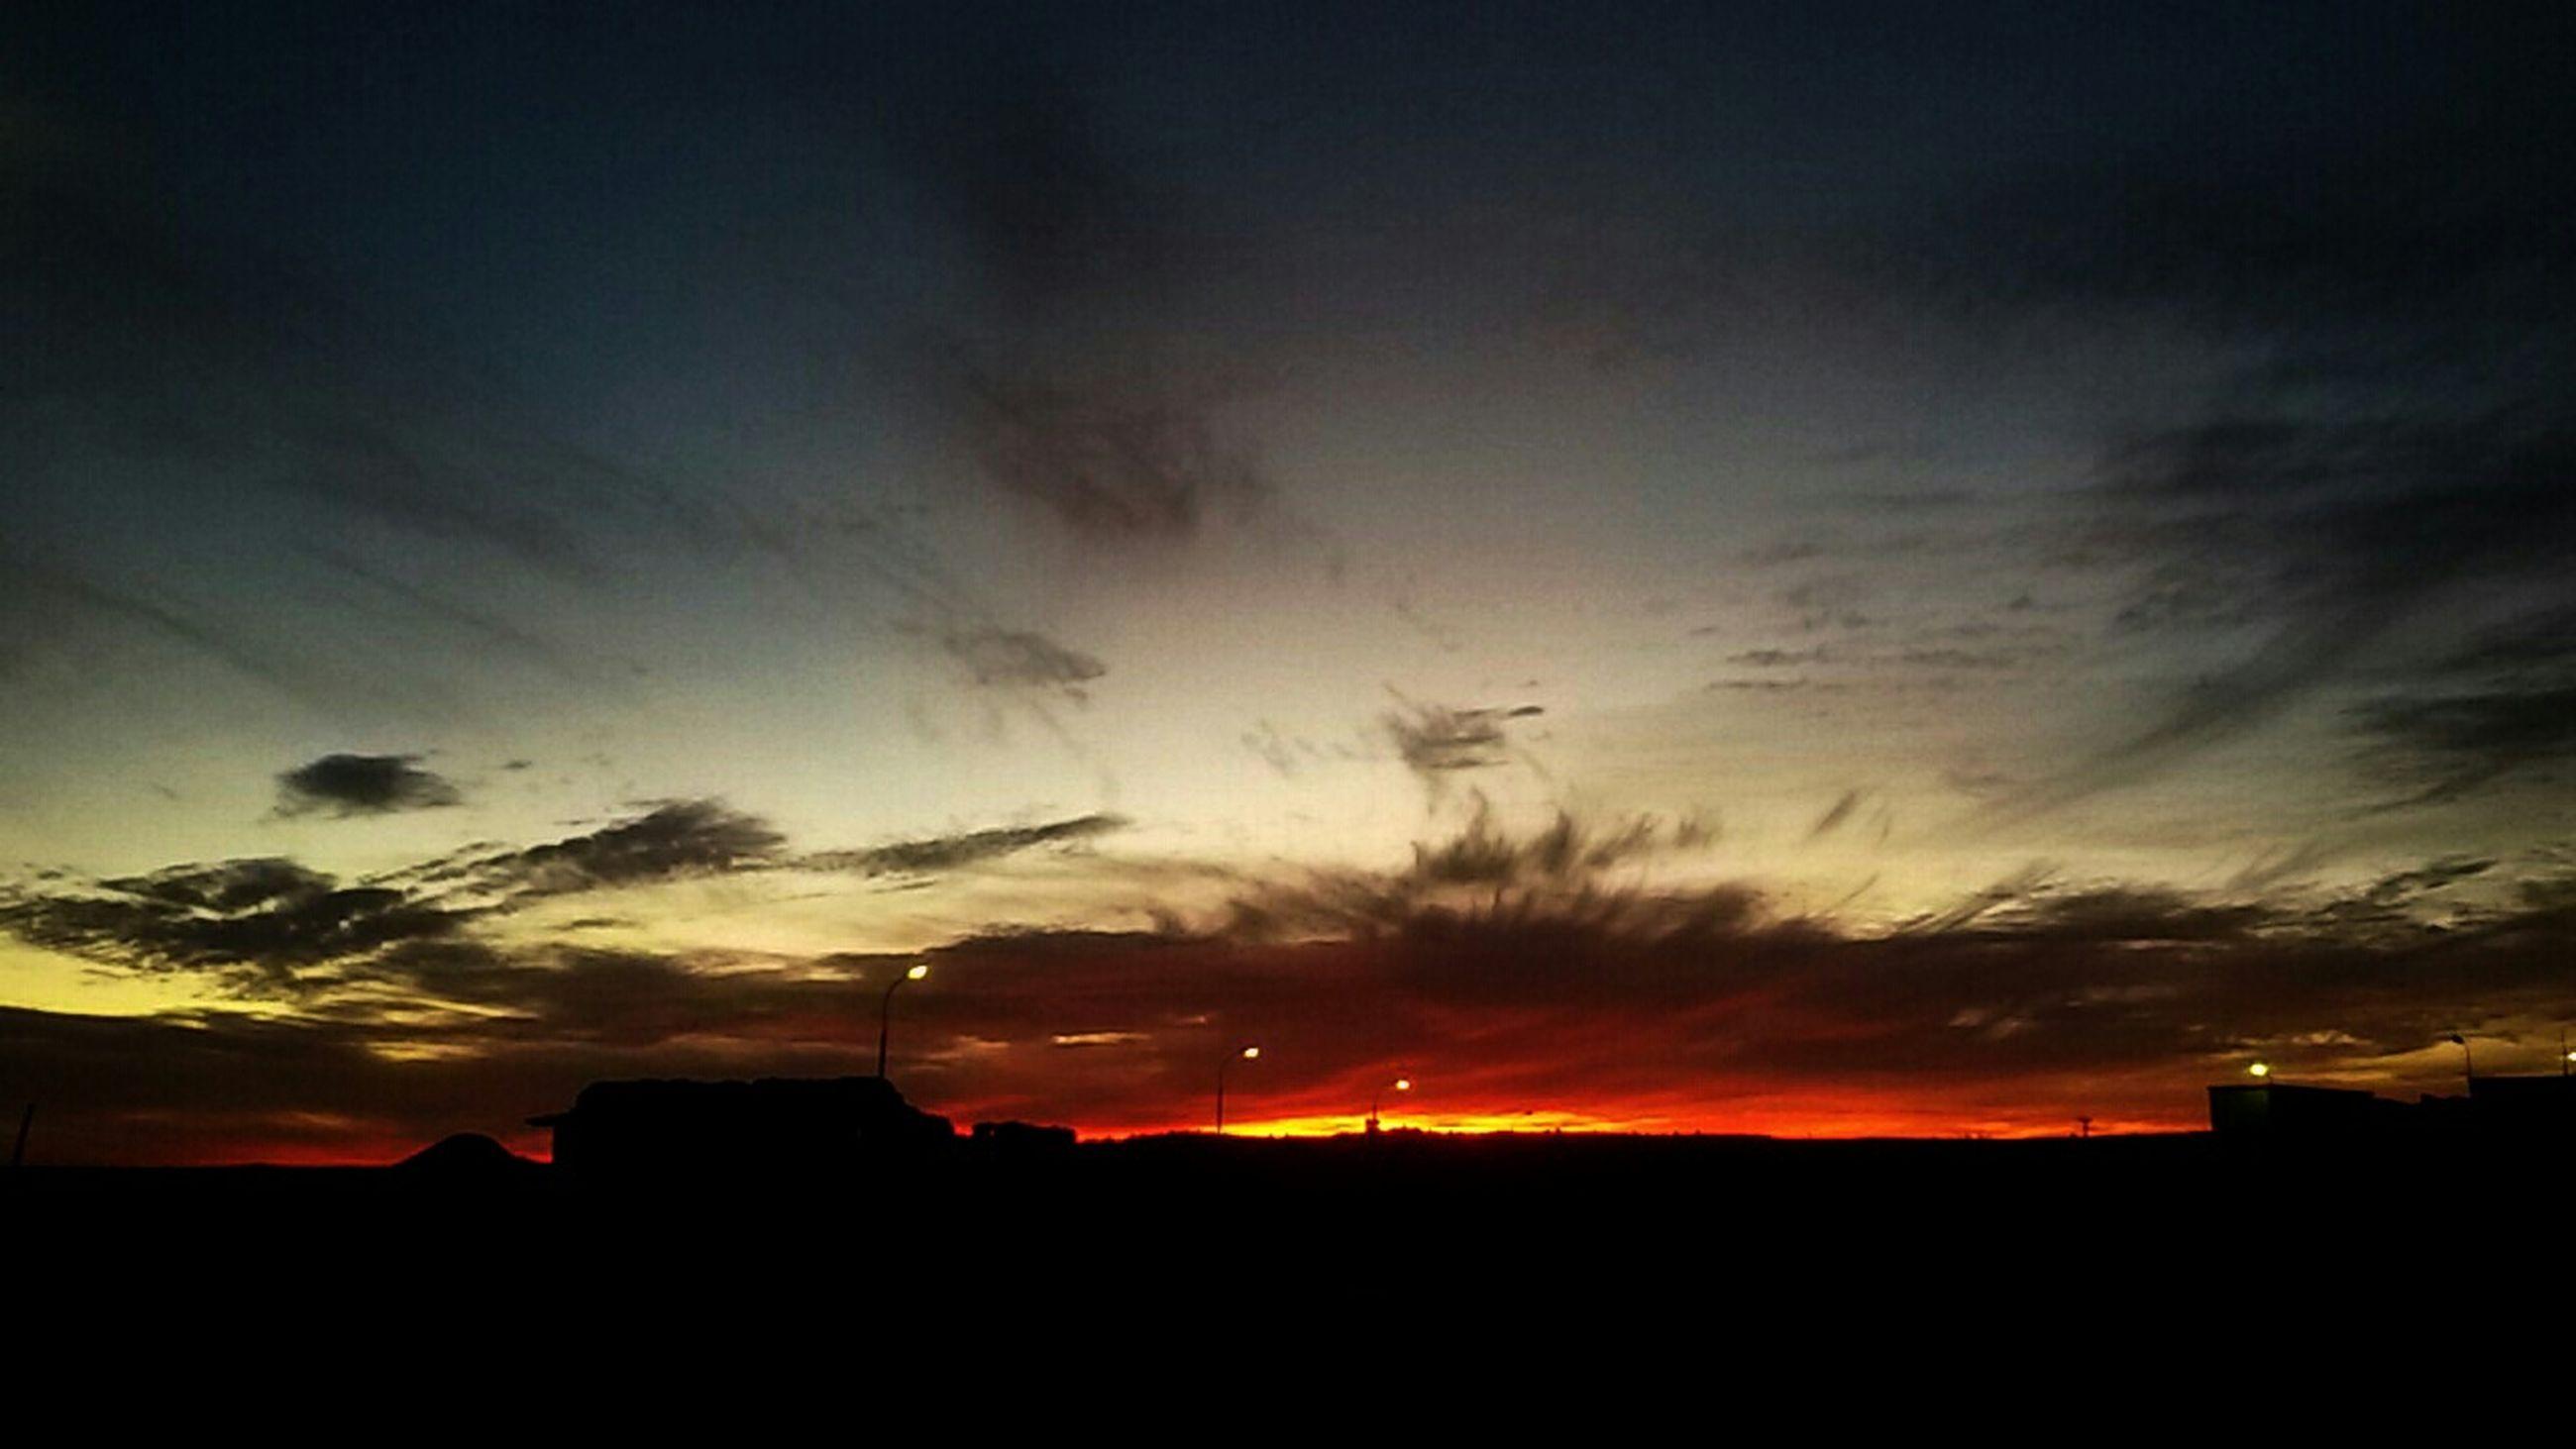 sunset, silhouette, sky, building exterior, built structure, architecture, orange color, cloud - sky, beauty in nature, scenics, sun, nature, cloud, dark, dramatic sky, house, outdoors, dusk, tranquil scene, moody sky